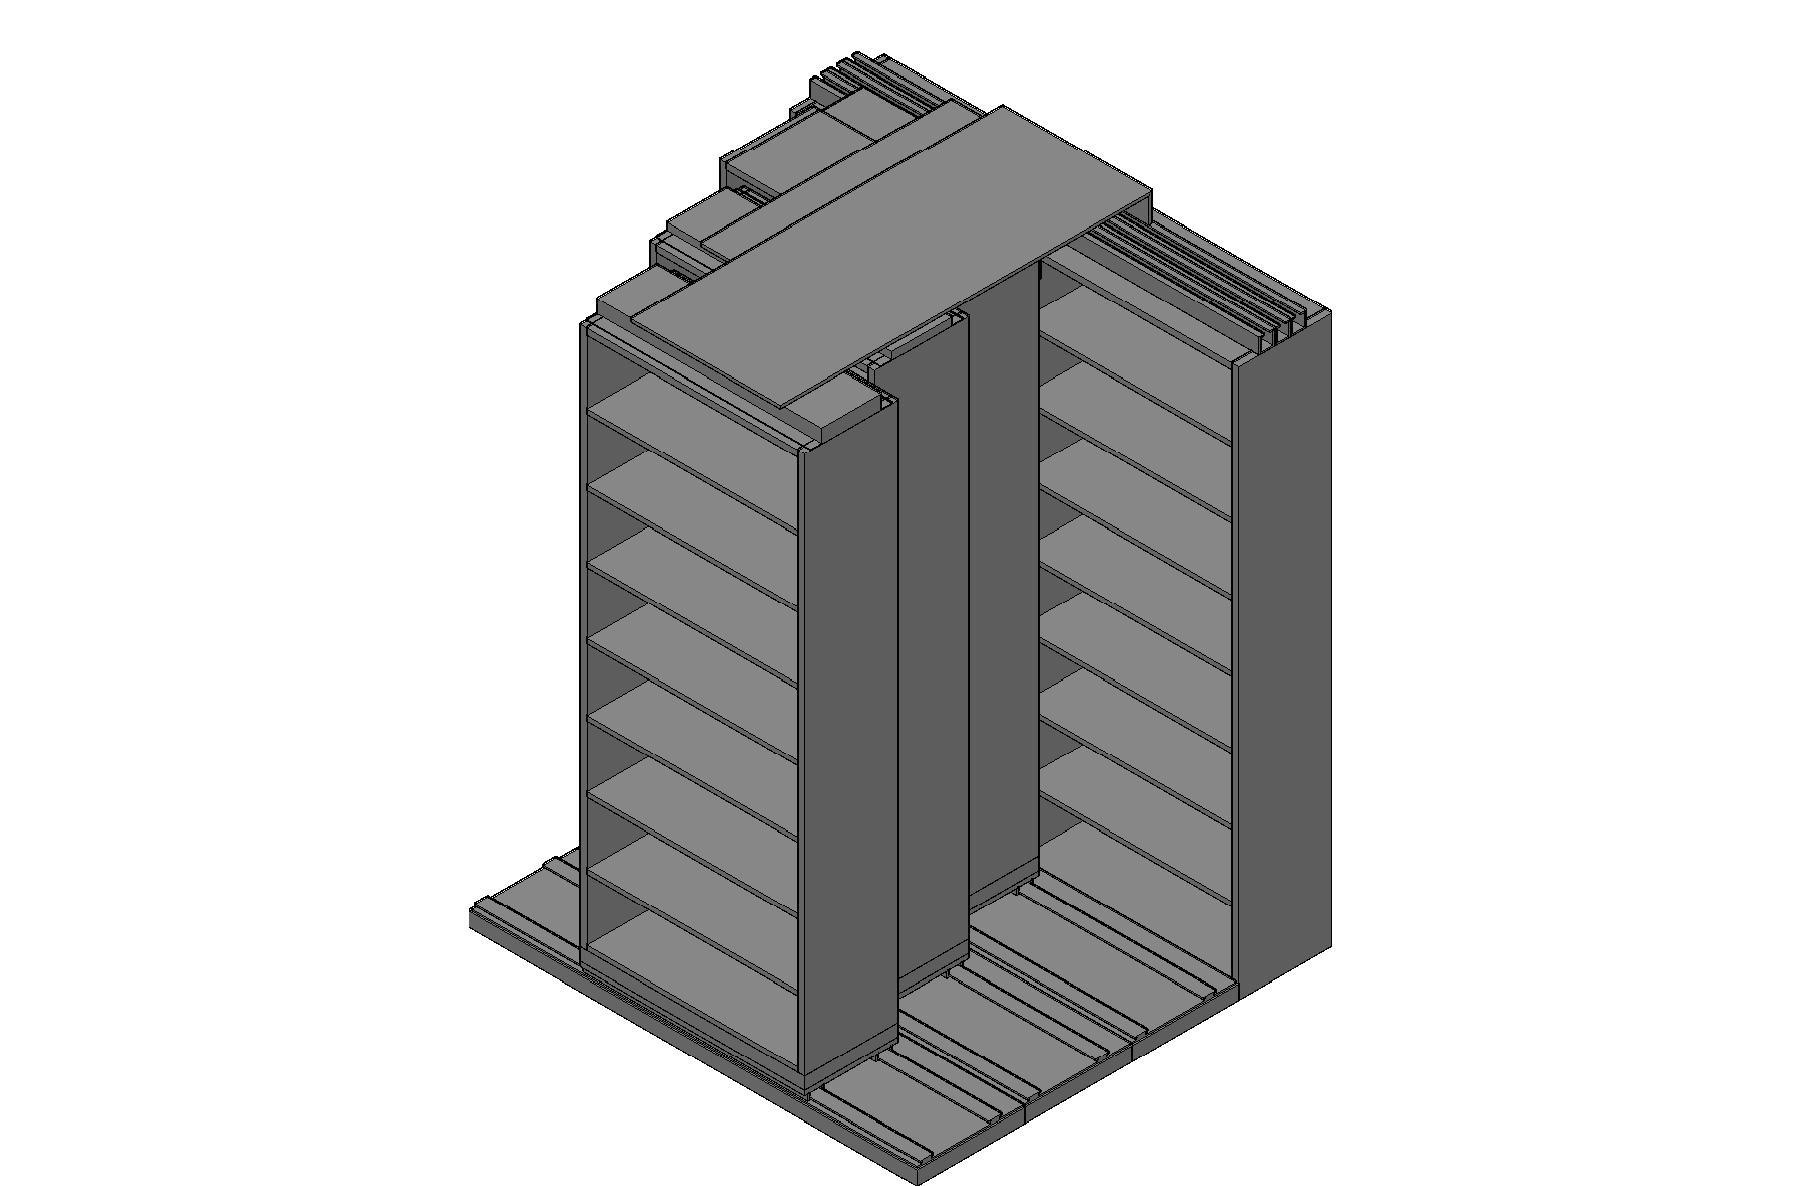 "Legal Size Sliding Shelves - 4 Rows Deep - 8 Levels - (36"" x 15"" Shelves) - 76"" Total Width"